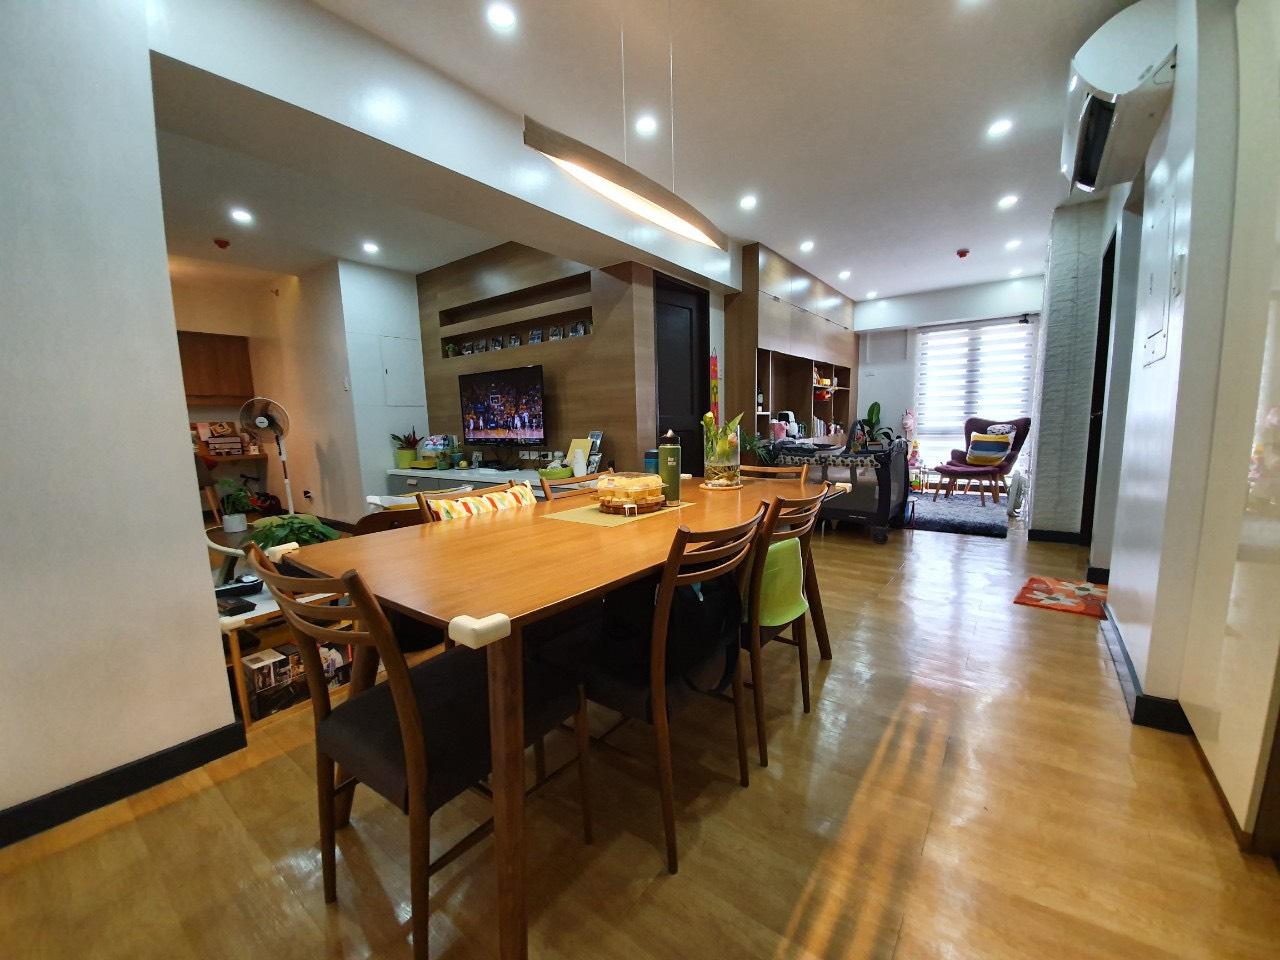 2BR Condo For Sale, Royal Palm Residences, Acacia Estate 8